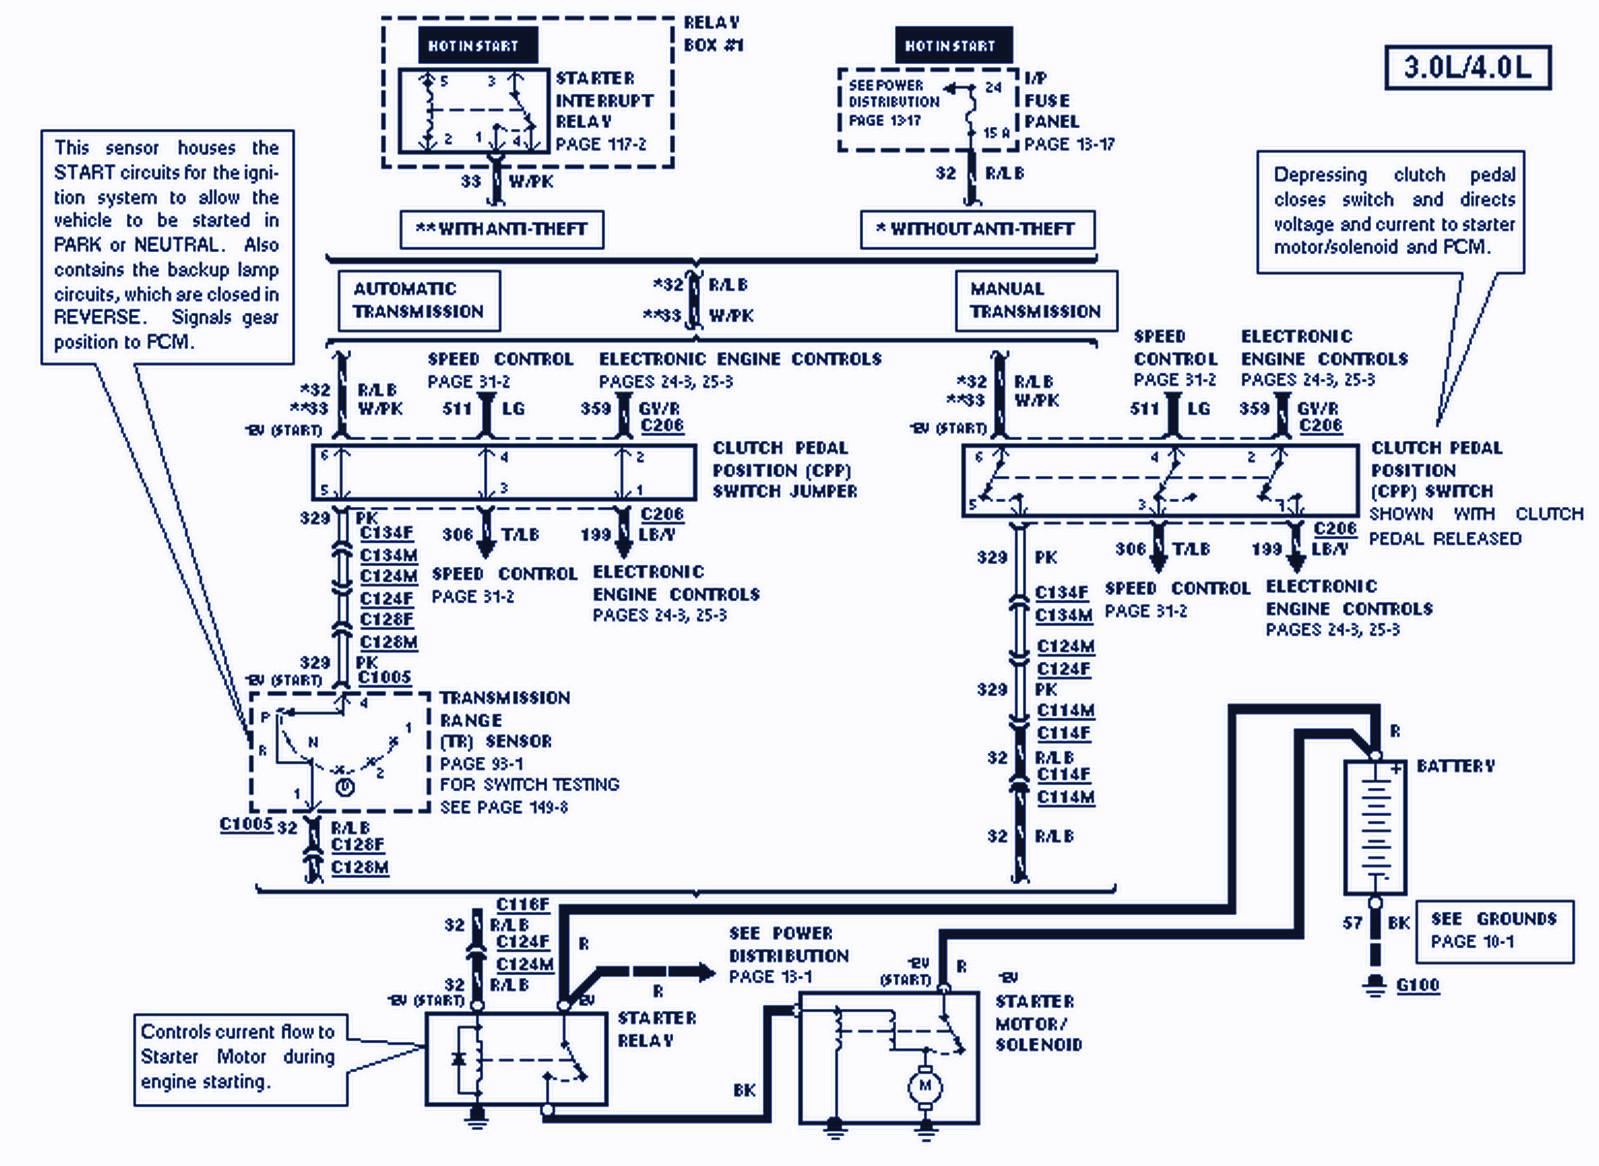 Panel Wiring Diagram For 2003 Ford Ranger Gauges